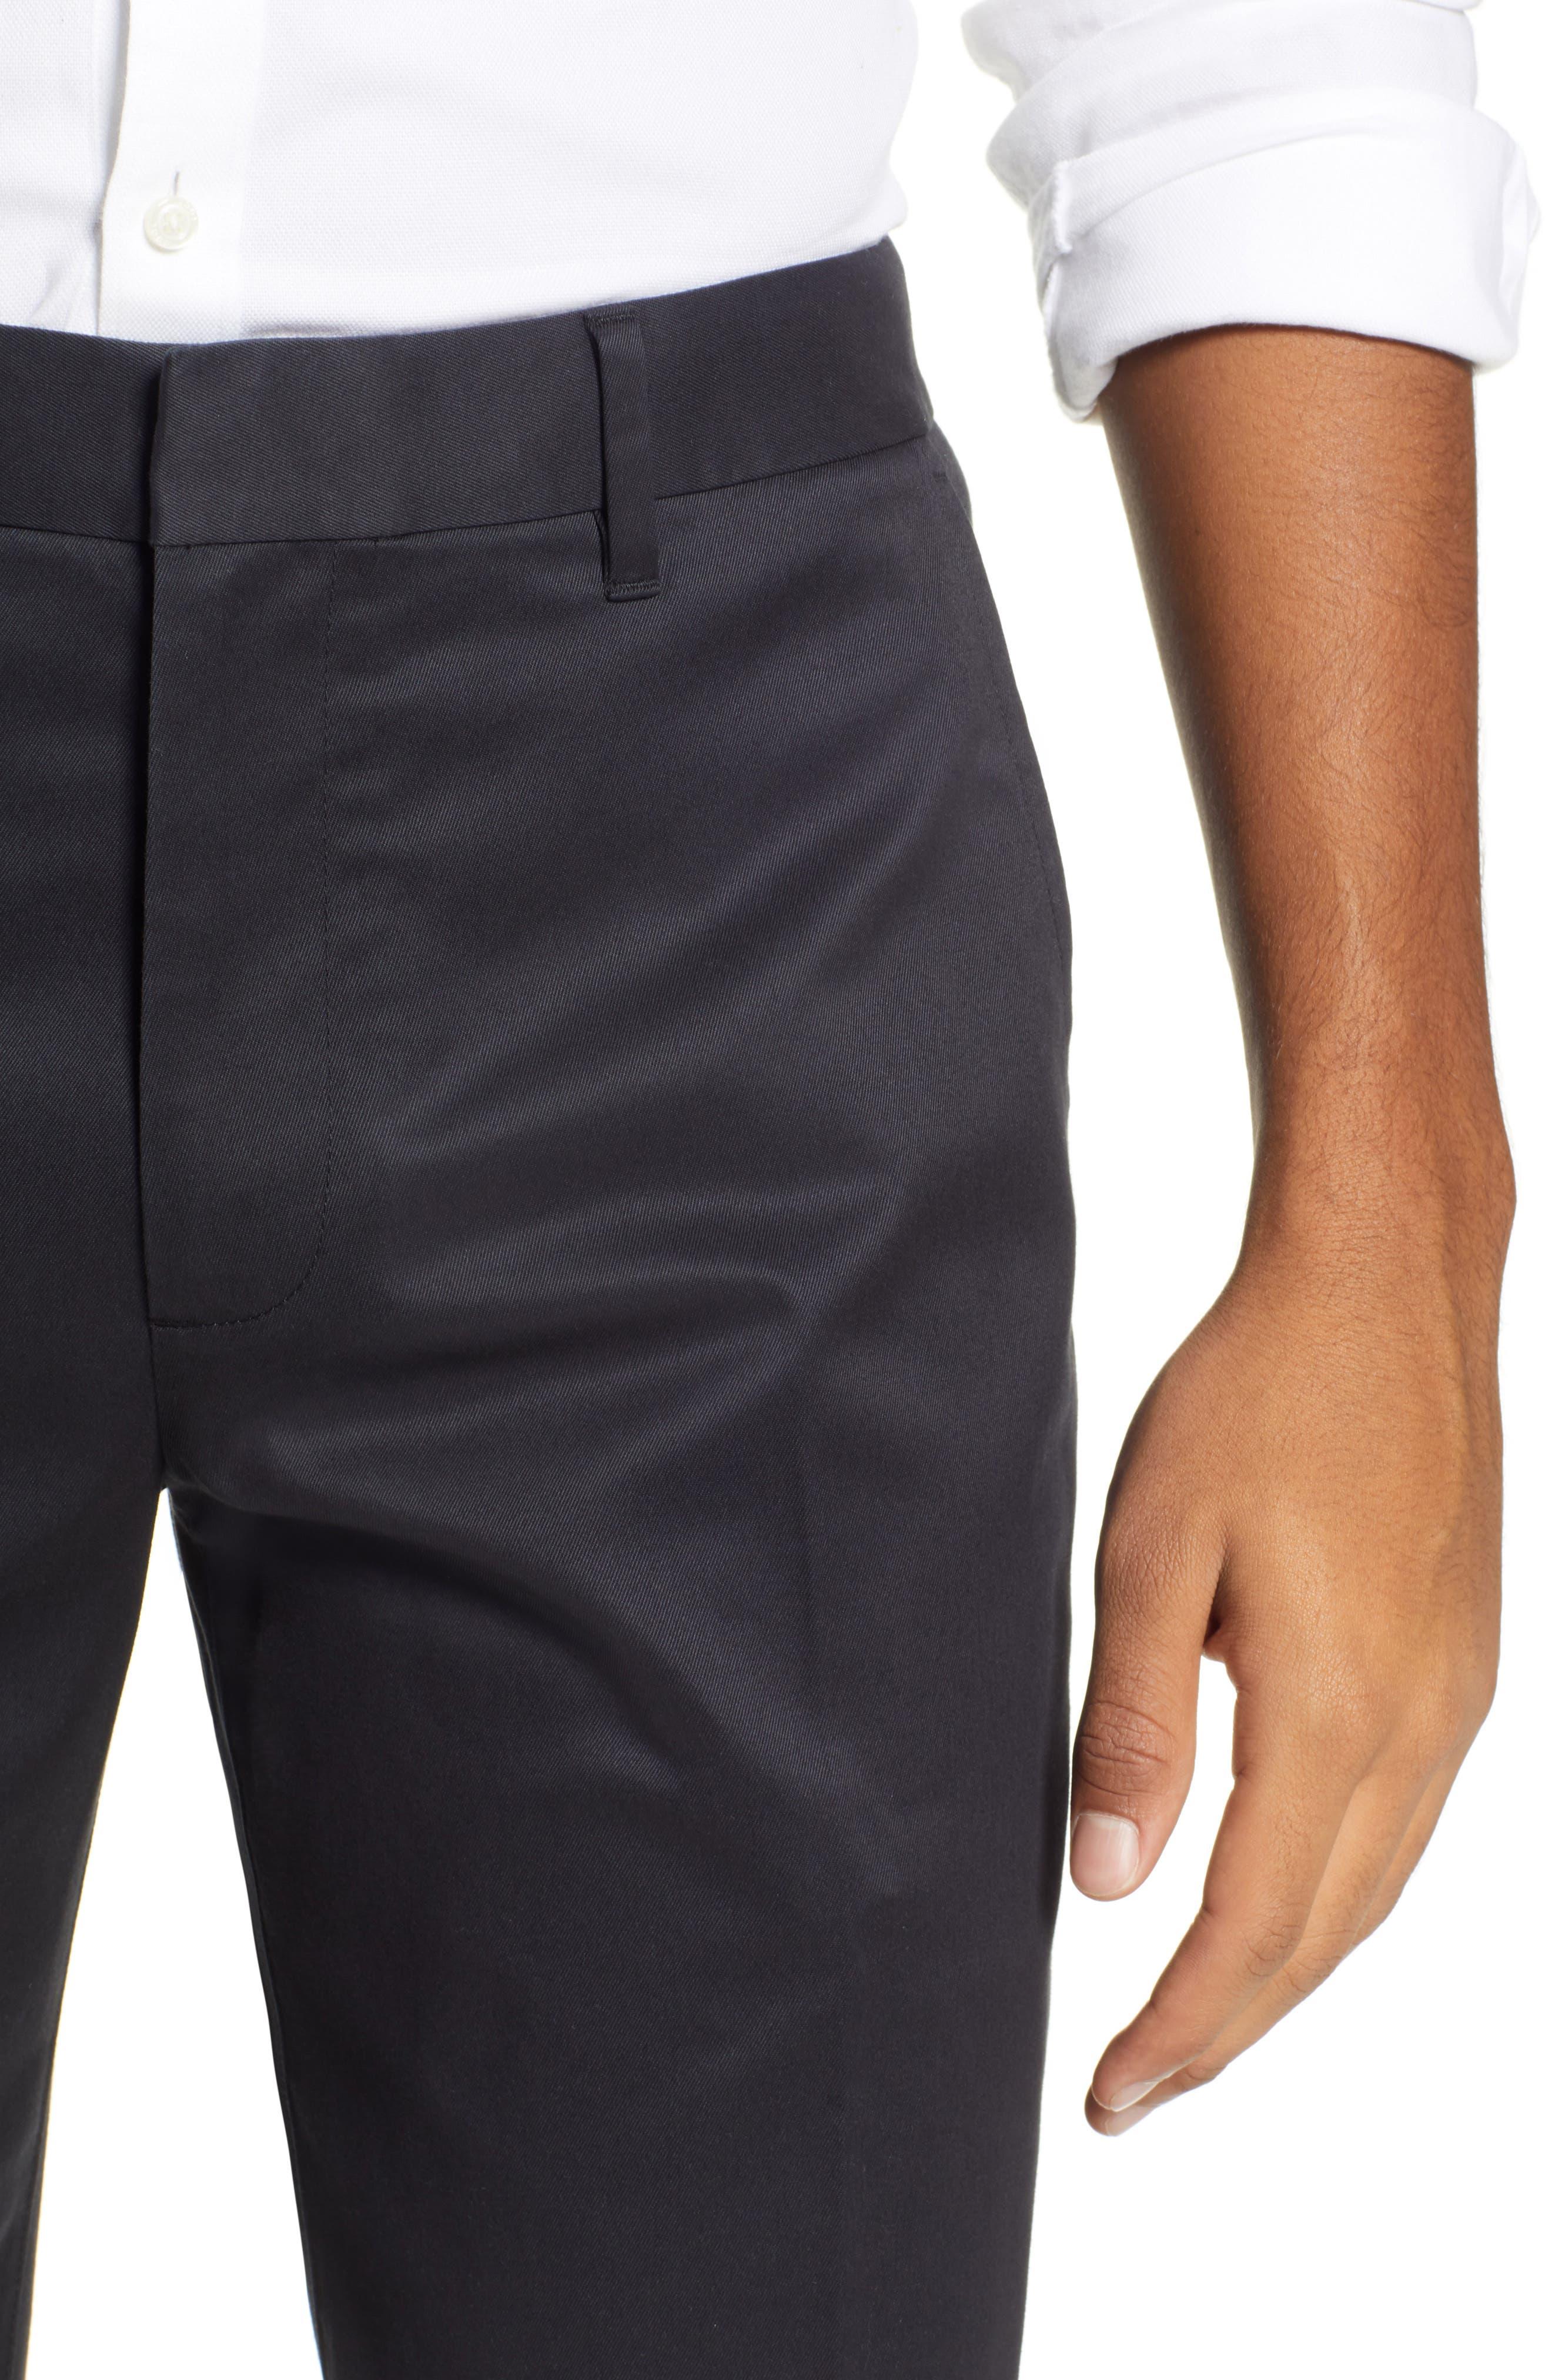 BONOBOS, Weekday Warrior Straight Leg Stretch Dress Pants, Alternate thumbnail 5, color, 001